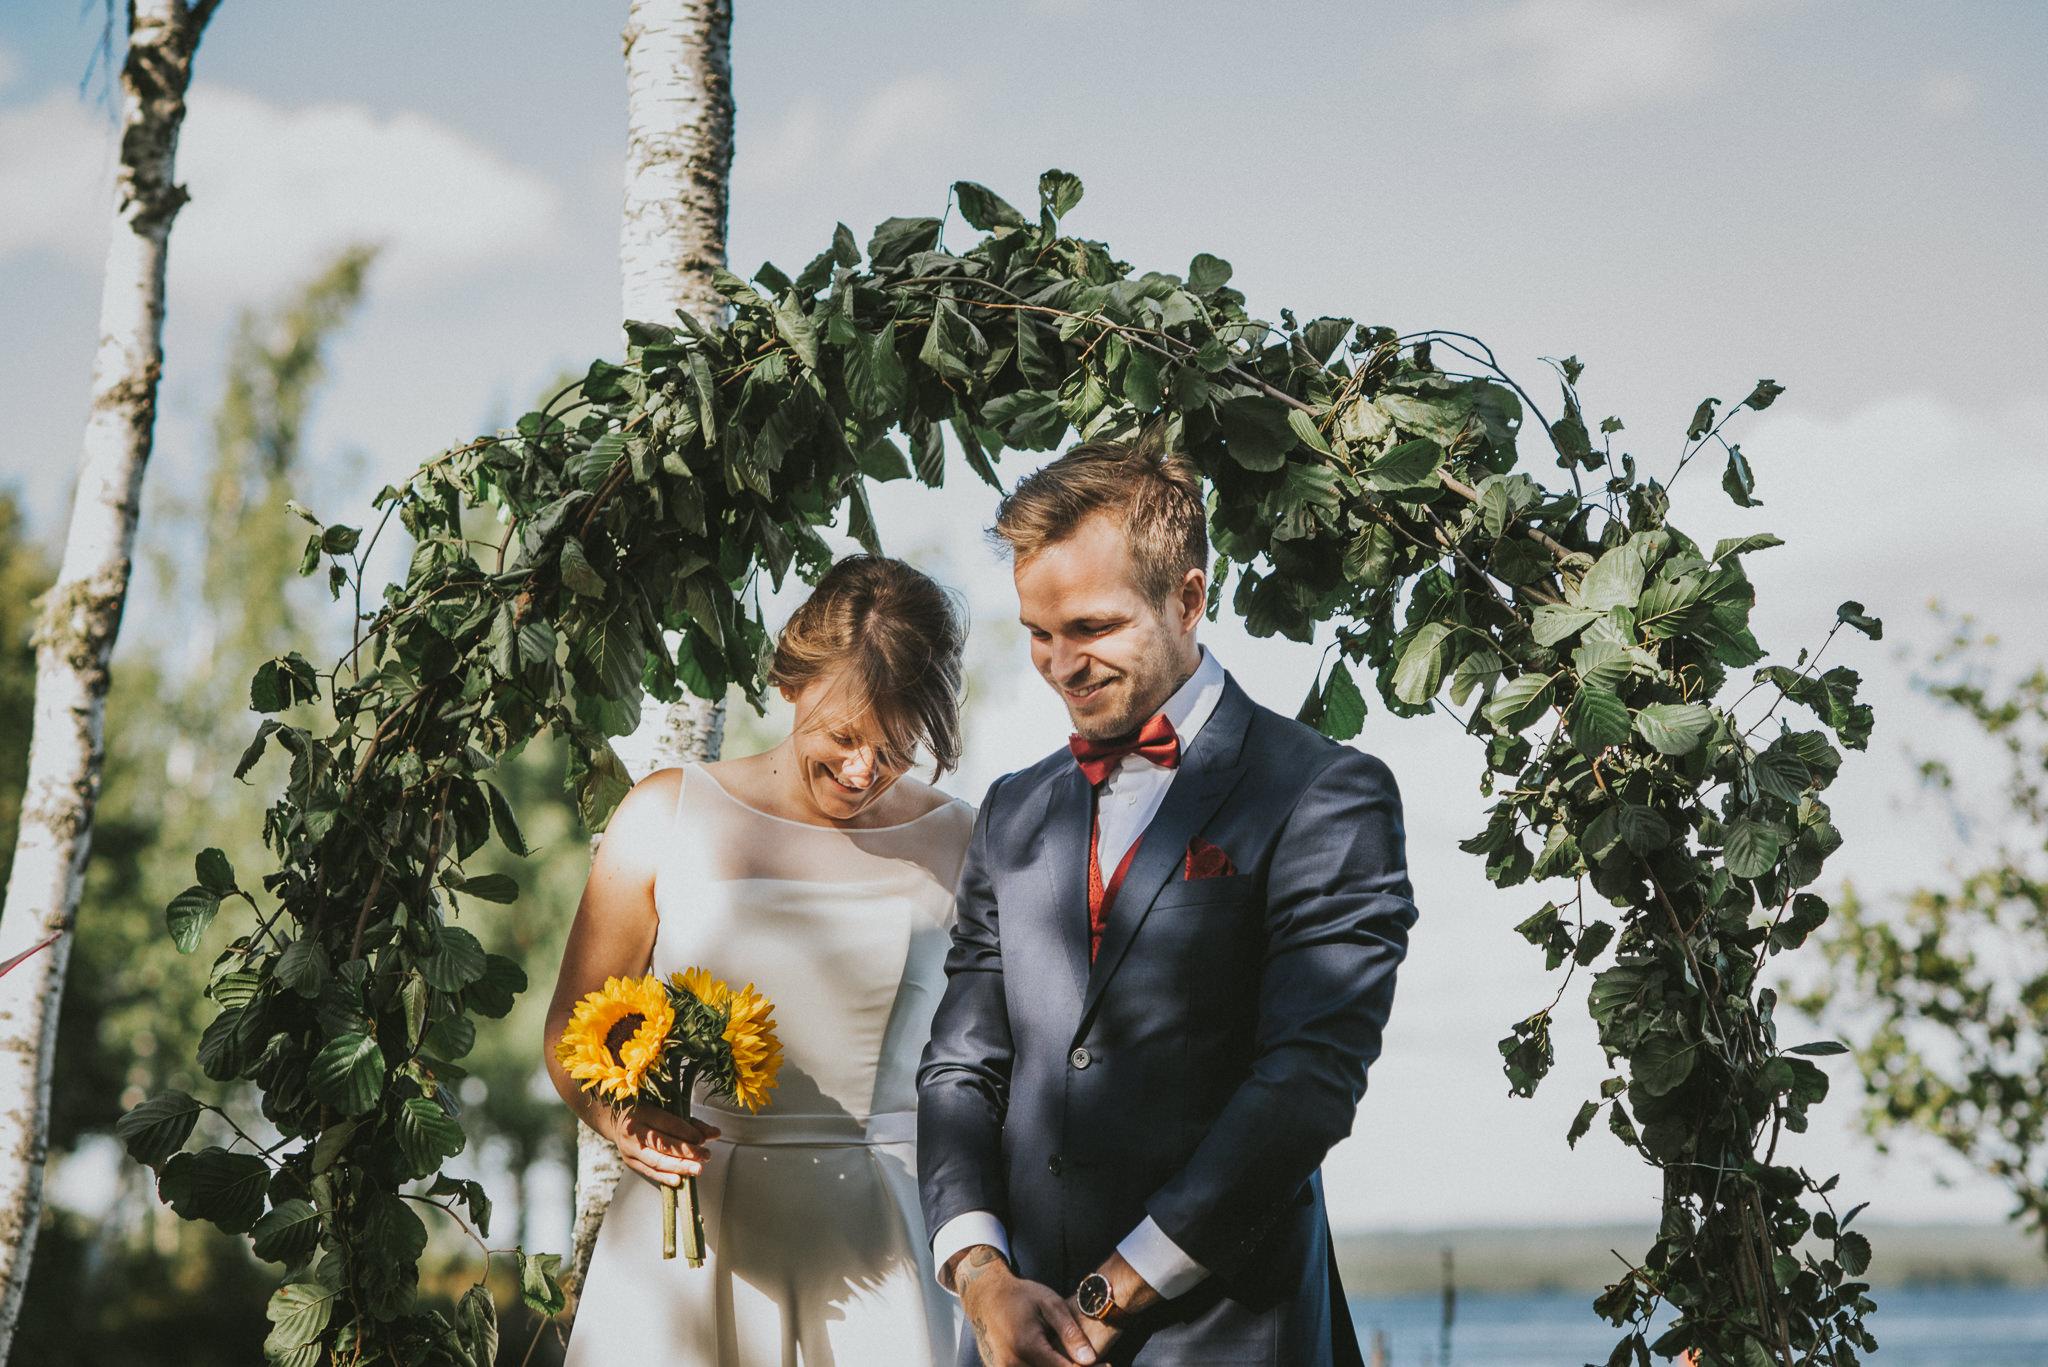 sweden-wedding-martarobin-8802-2.jpg